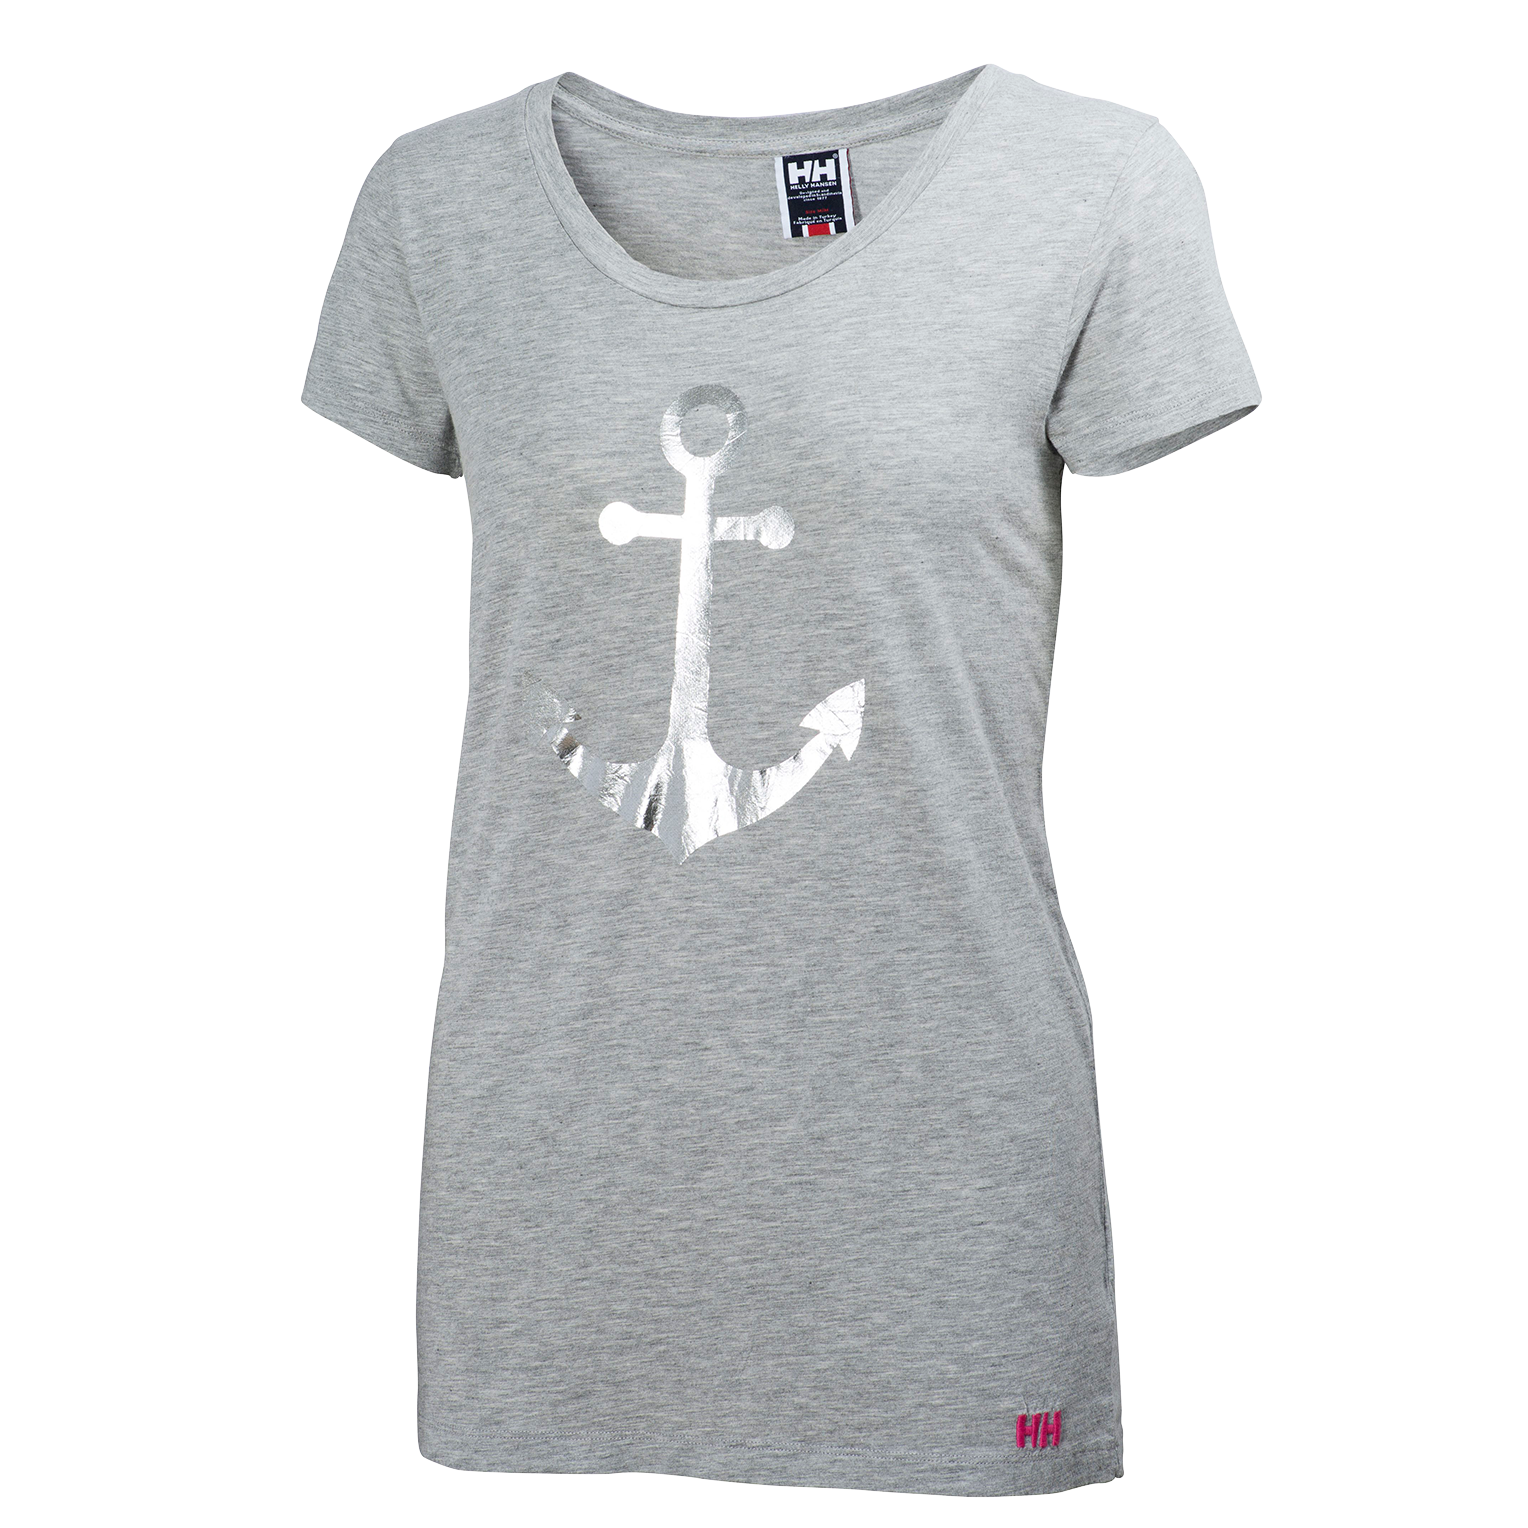 Helly hansen tri ko w graphic t shirt oneyacht e shop for Graphic t shirt shop